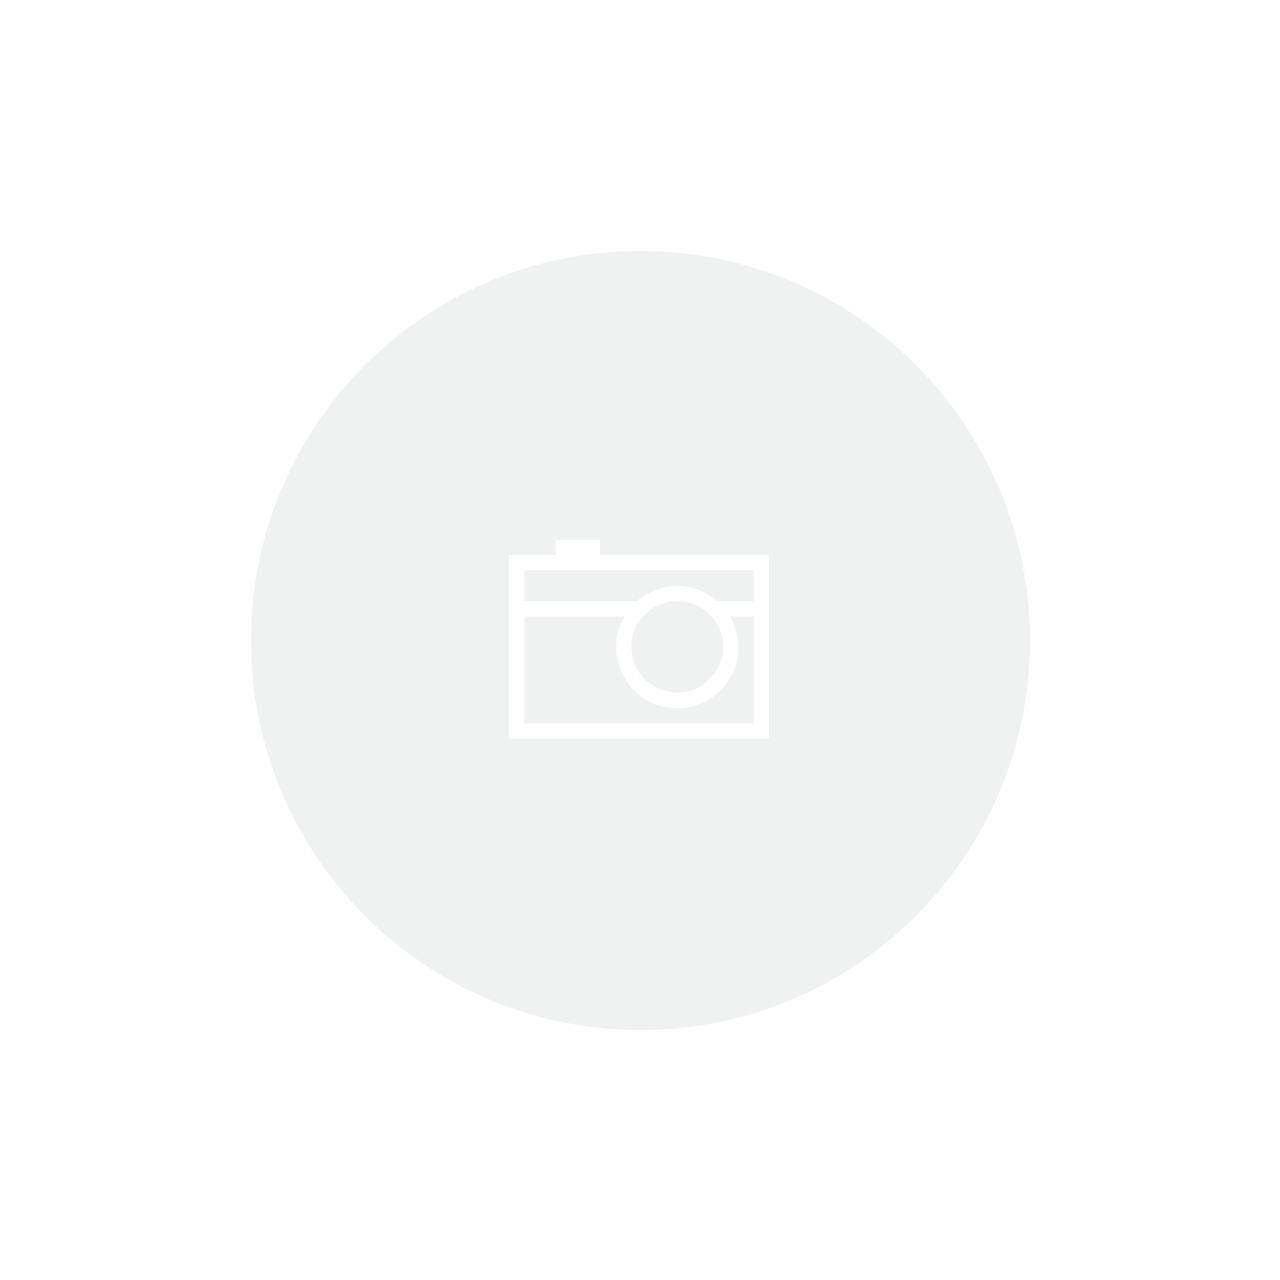 PNEU 26X2.10 CHAOYANG VICTORY H5129 KEVLAR S/ ARAME